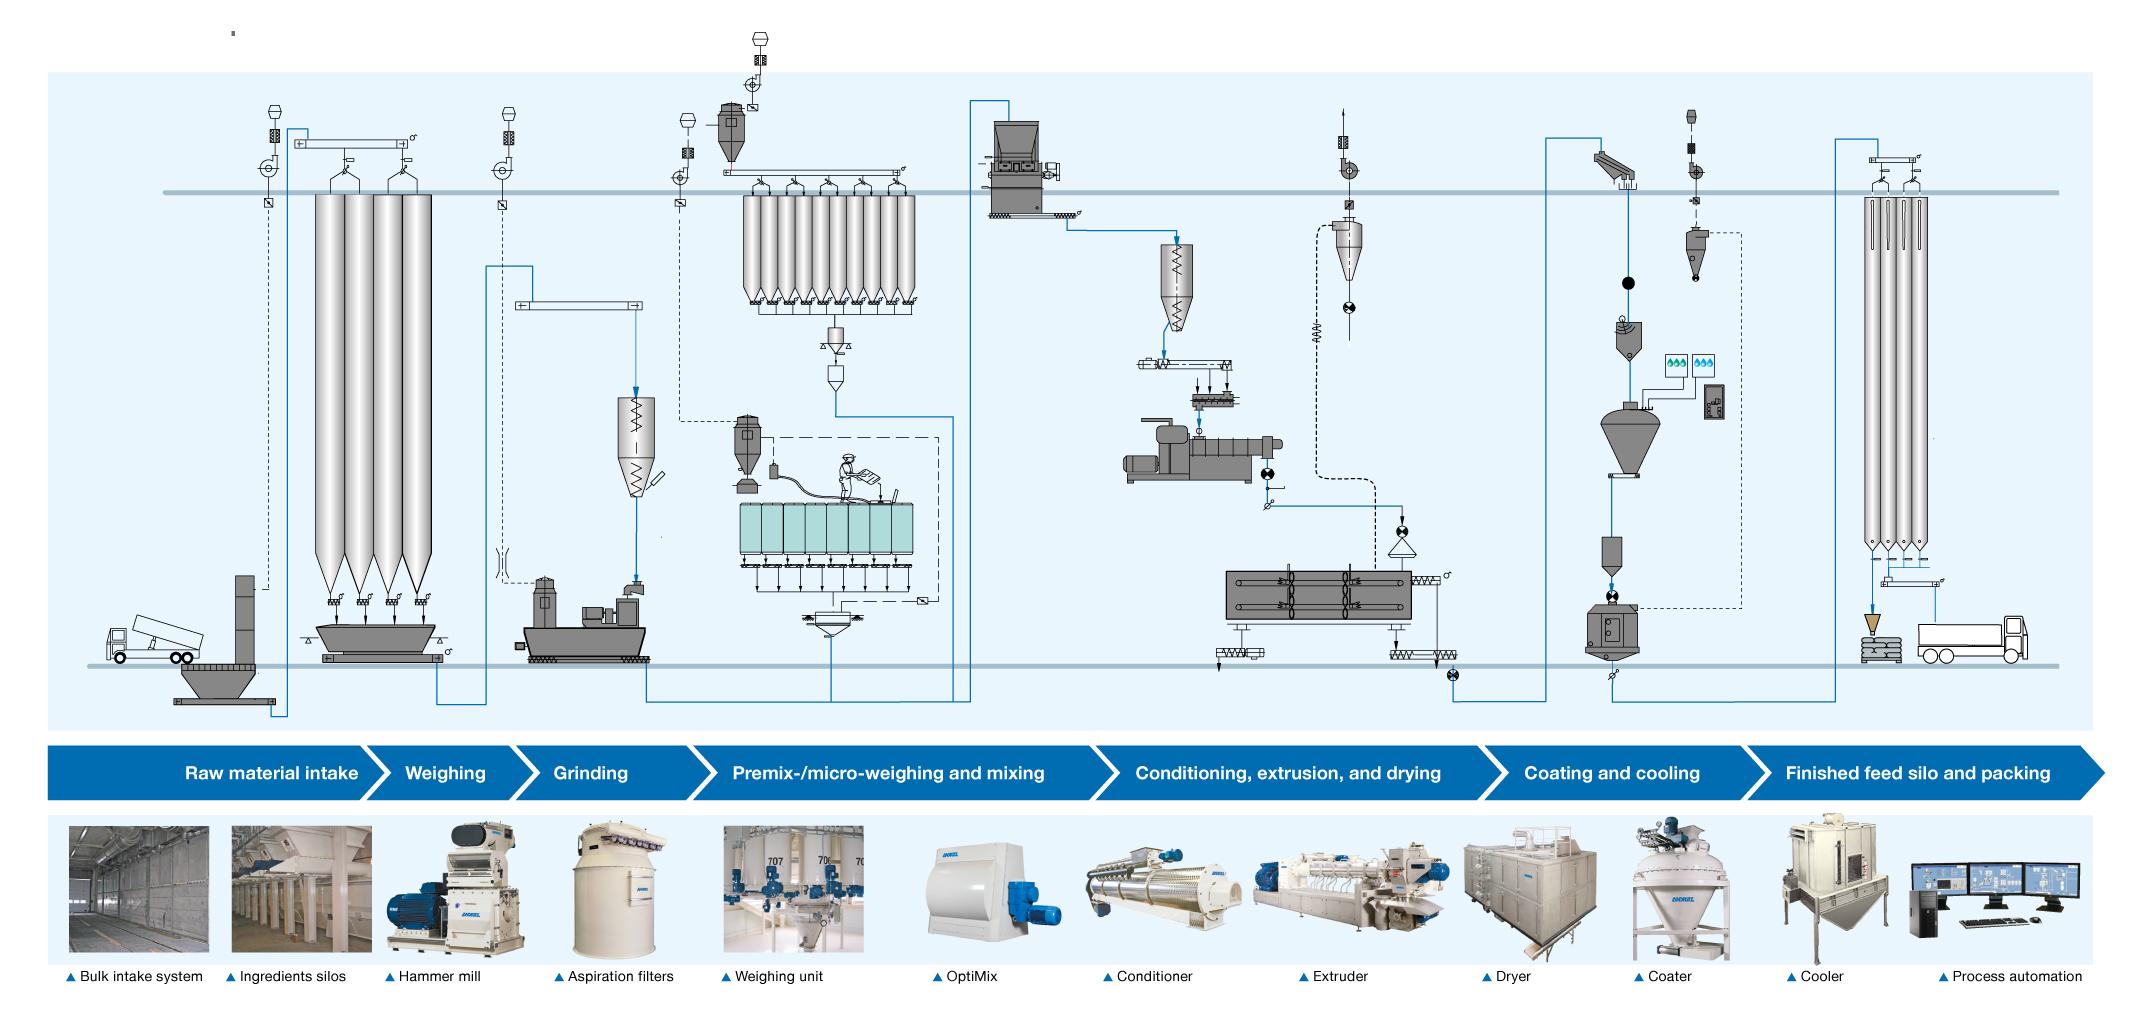 Aqua Feed Processing